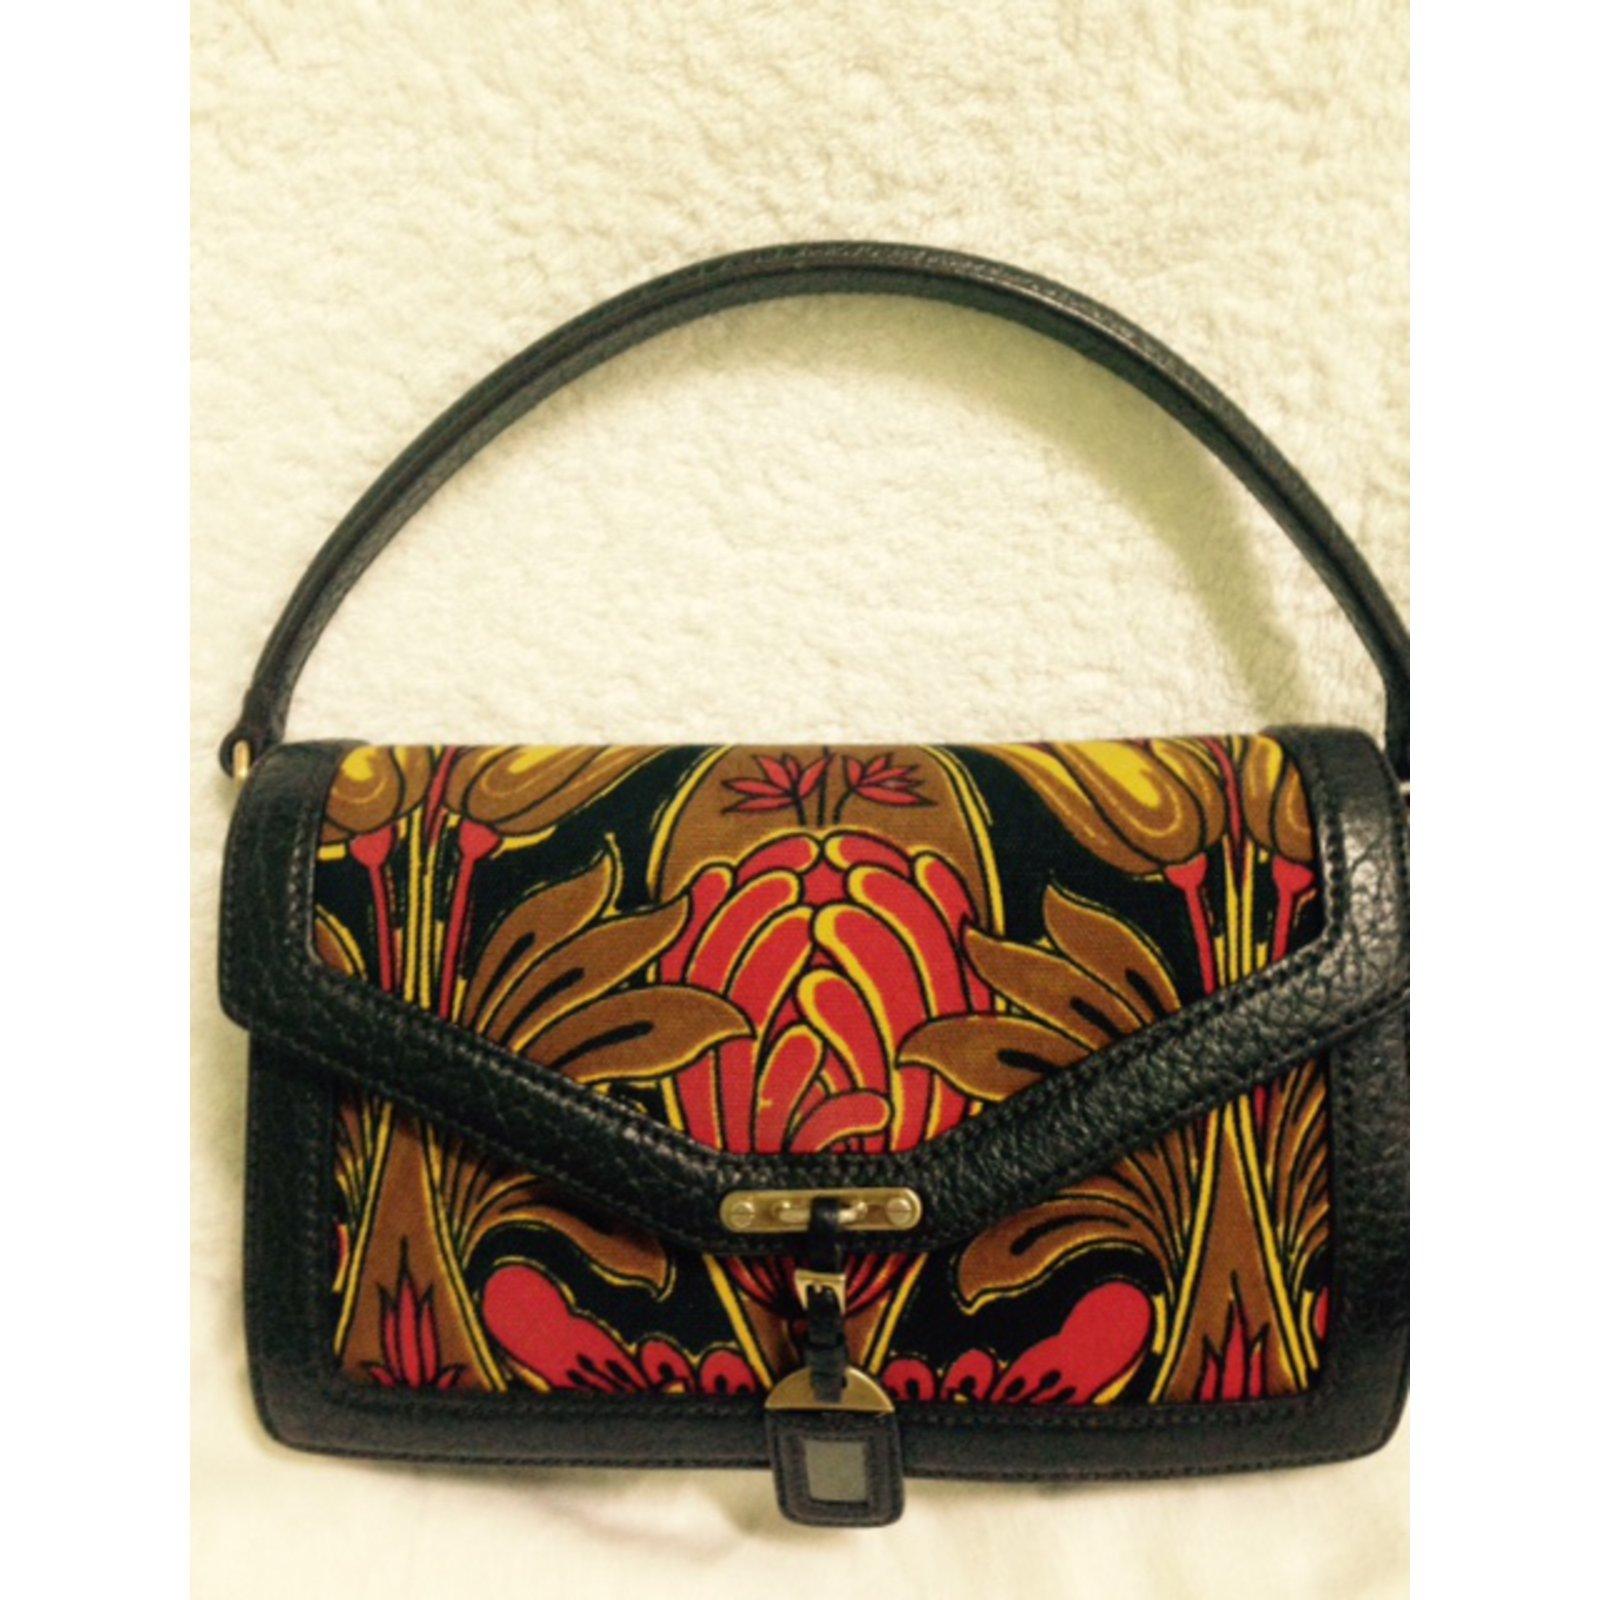 ... tote bag Handbags nylon Black ref.76590 - Joli C buy online 837eb  Prada  BN0956 CANAPA TULIPANO ROSSO+EBANO Handbags Cloth Multiple colors ref.42233  - ... 03763fab08